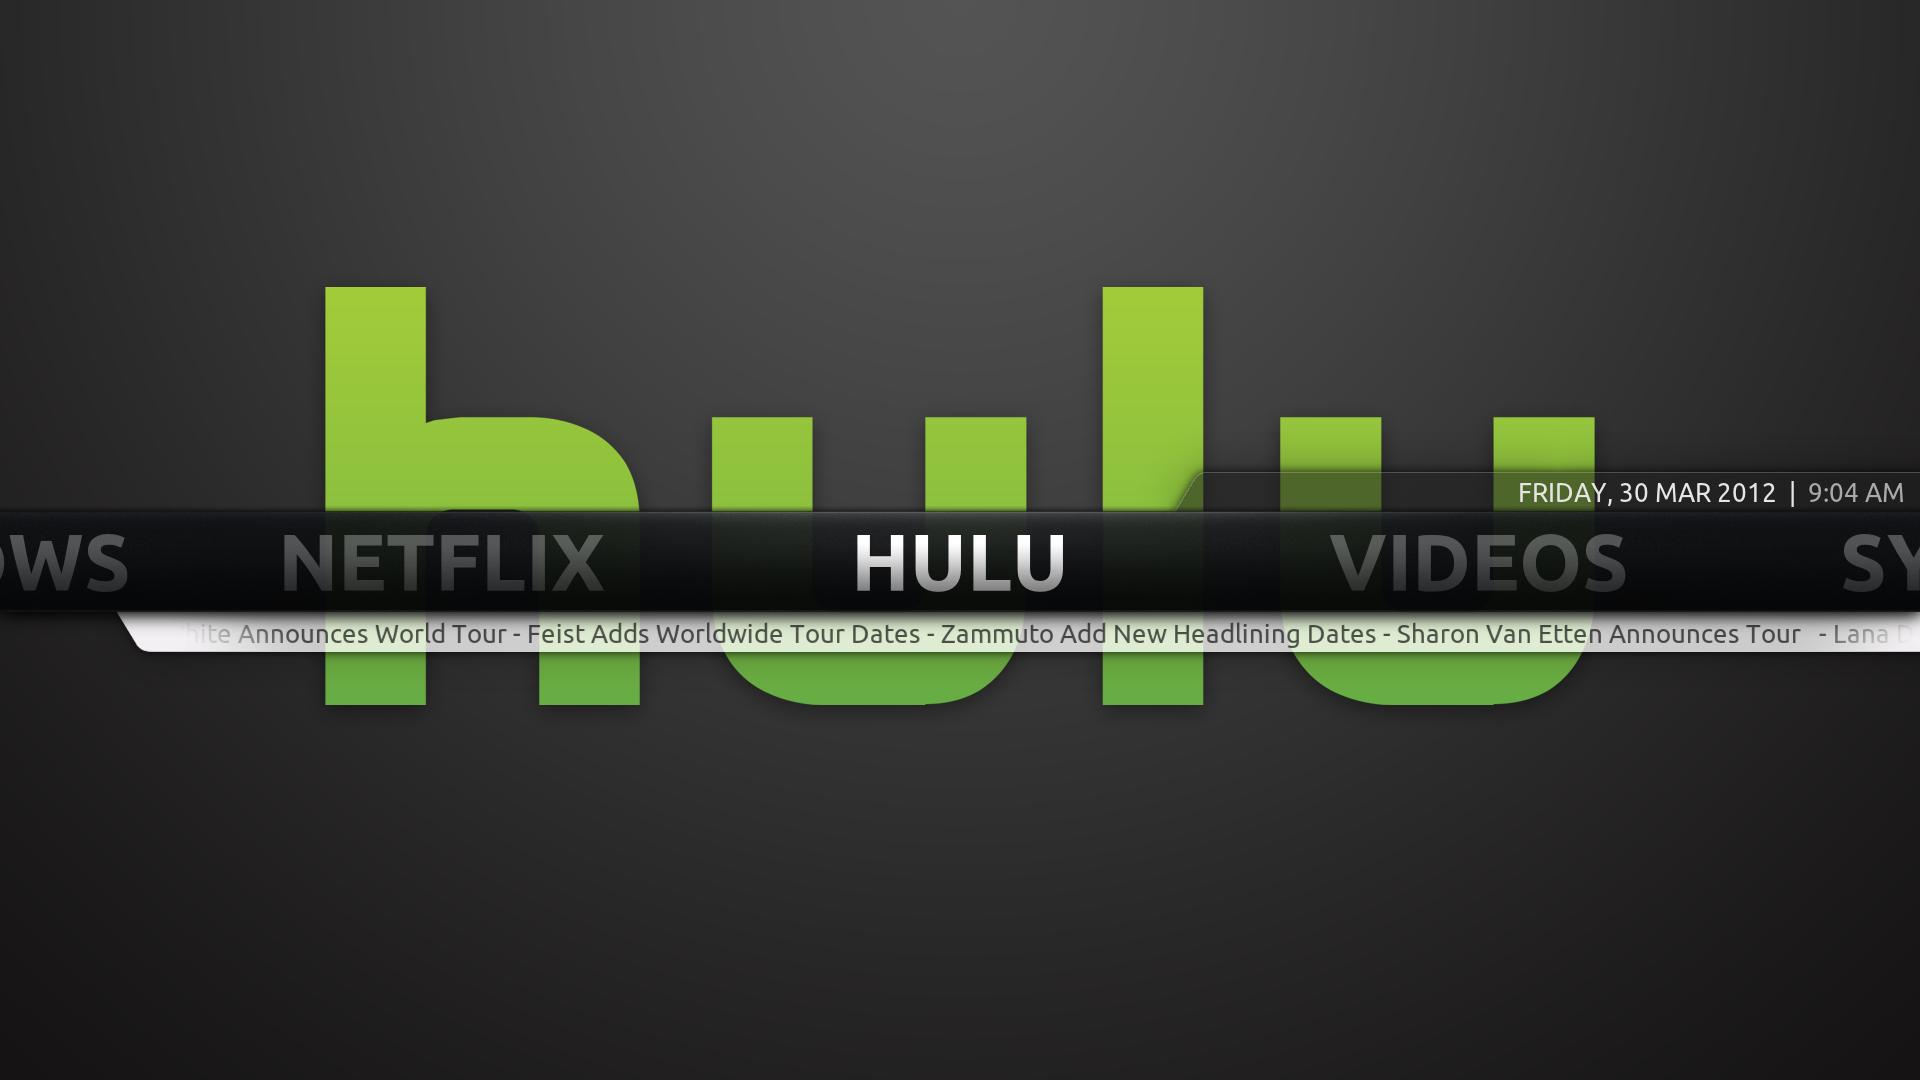 HTPC Geek Project: Launching Netflix WMC and Hulu Desktop